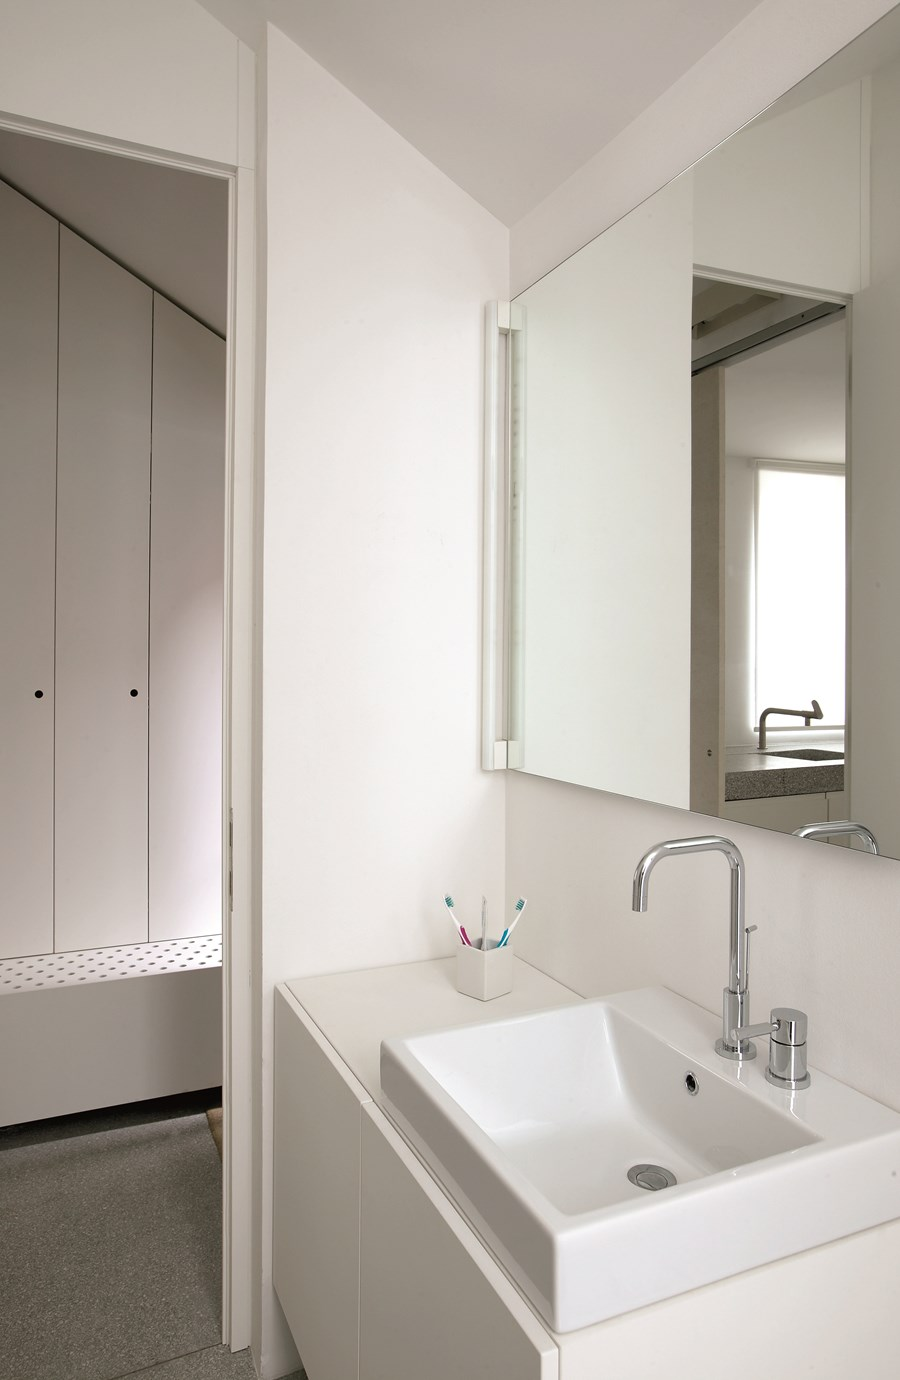 XXS house by Dekleva Gregoric Arhitekti 10